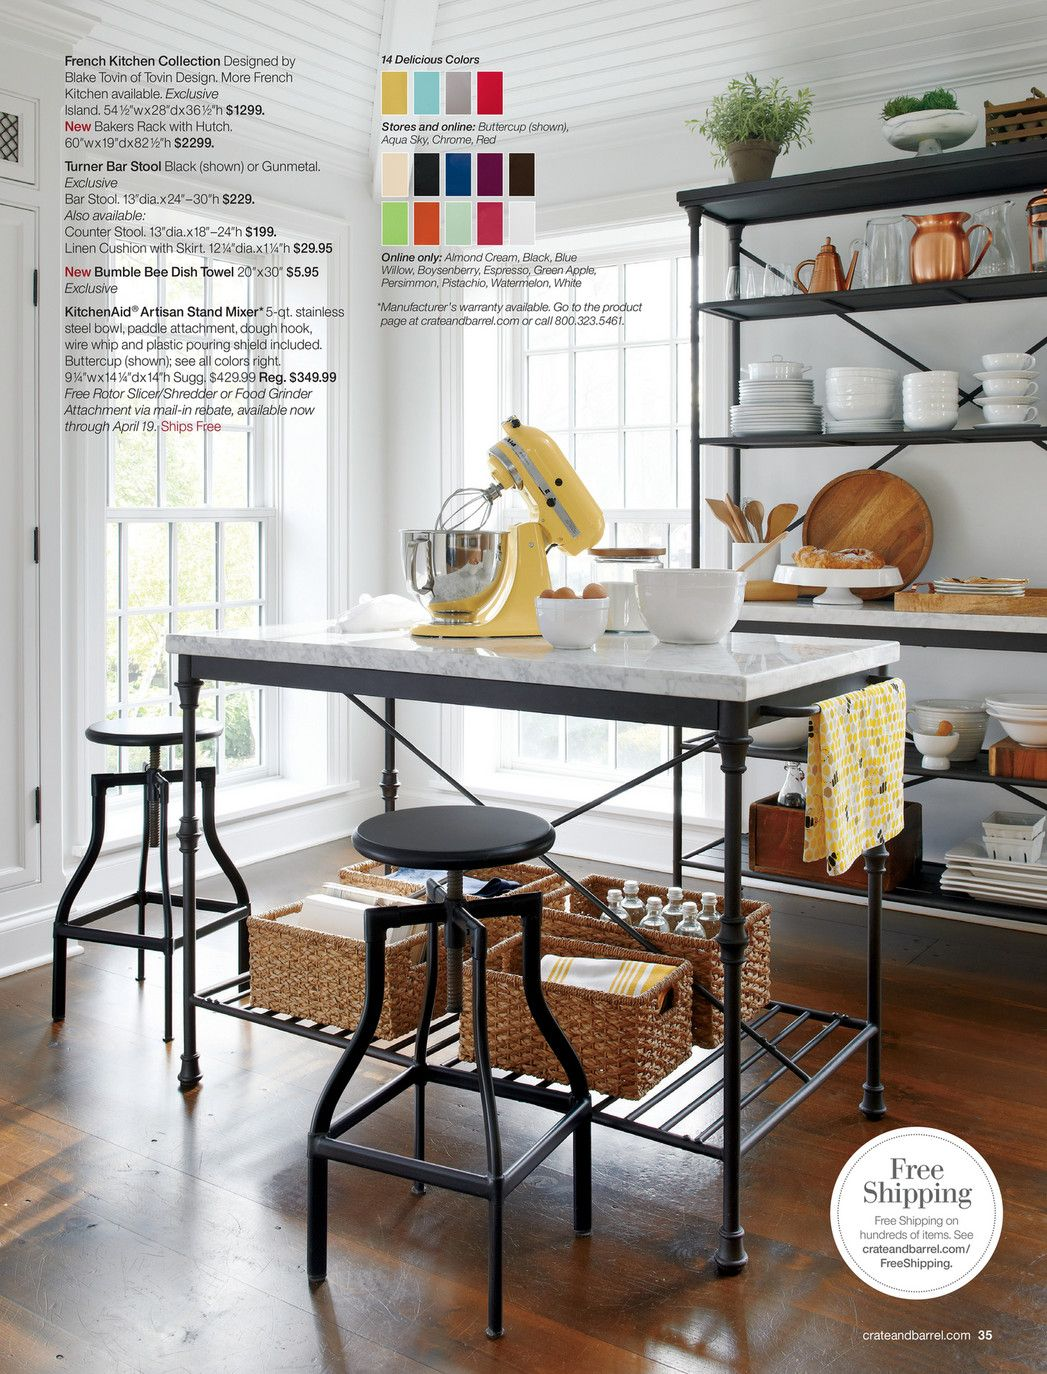 Crate Barrel Make Your House A Summer House Spring 2016 Page 34 35 Freestanding Kitchen Island Freestanding Kitchen Kitchen Design